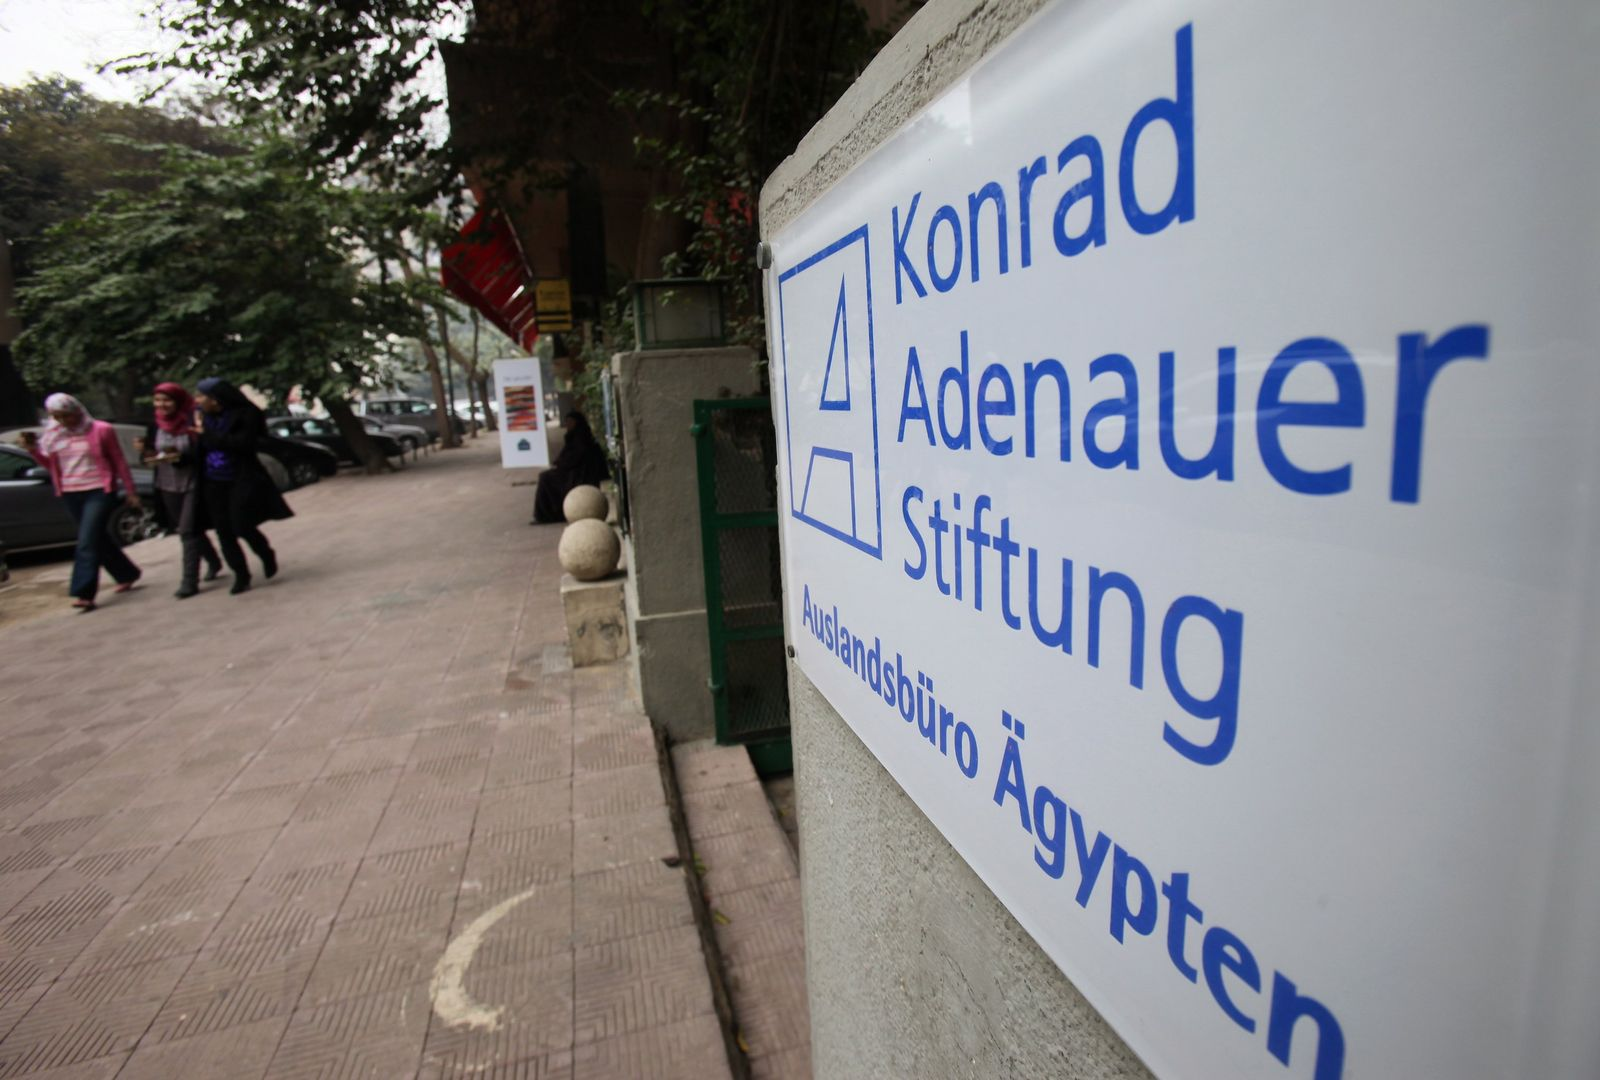 Konrad-adenauer-stiftung in kairo